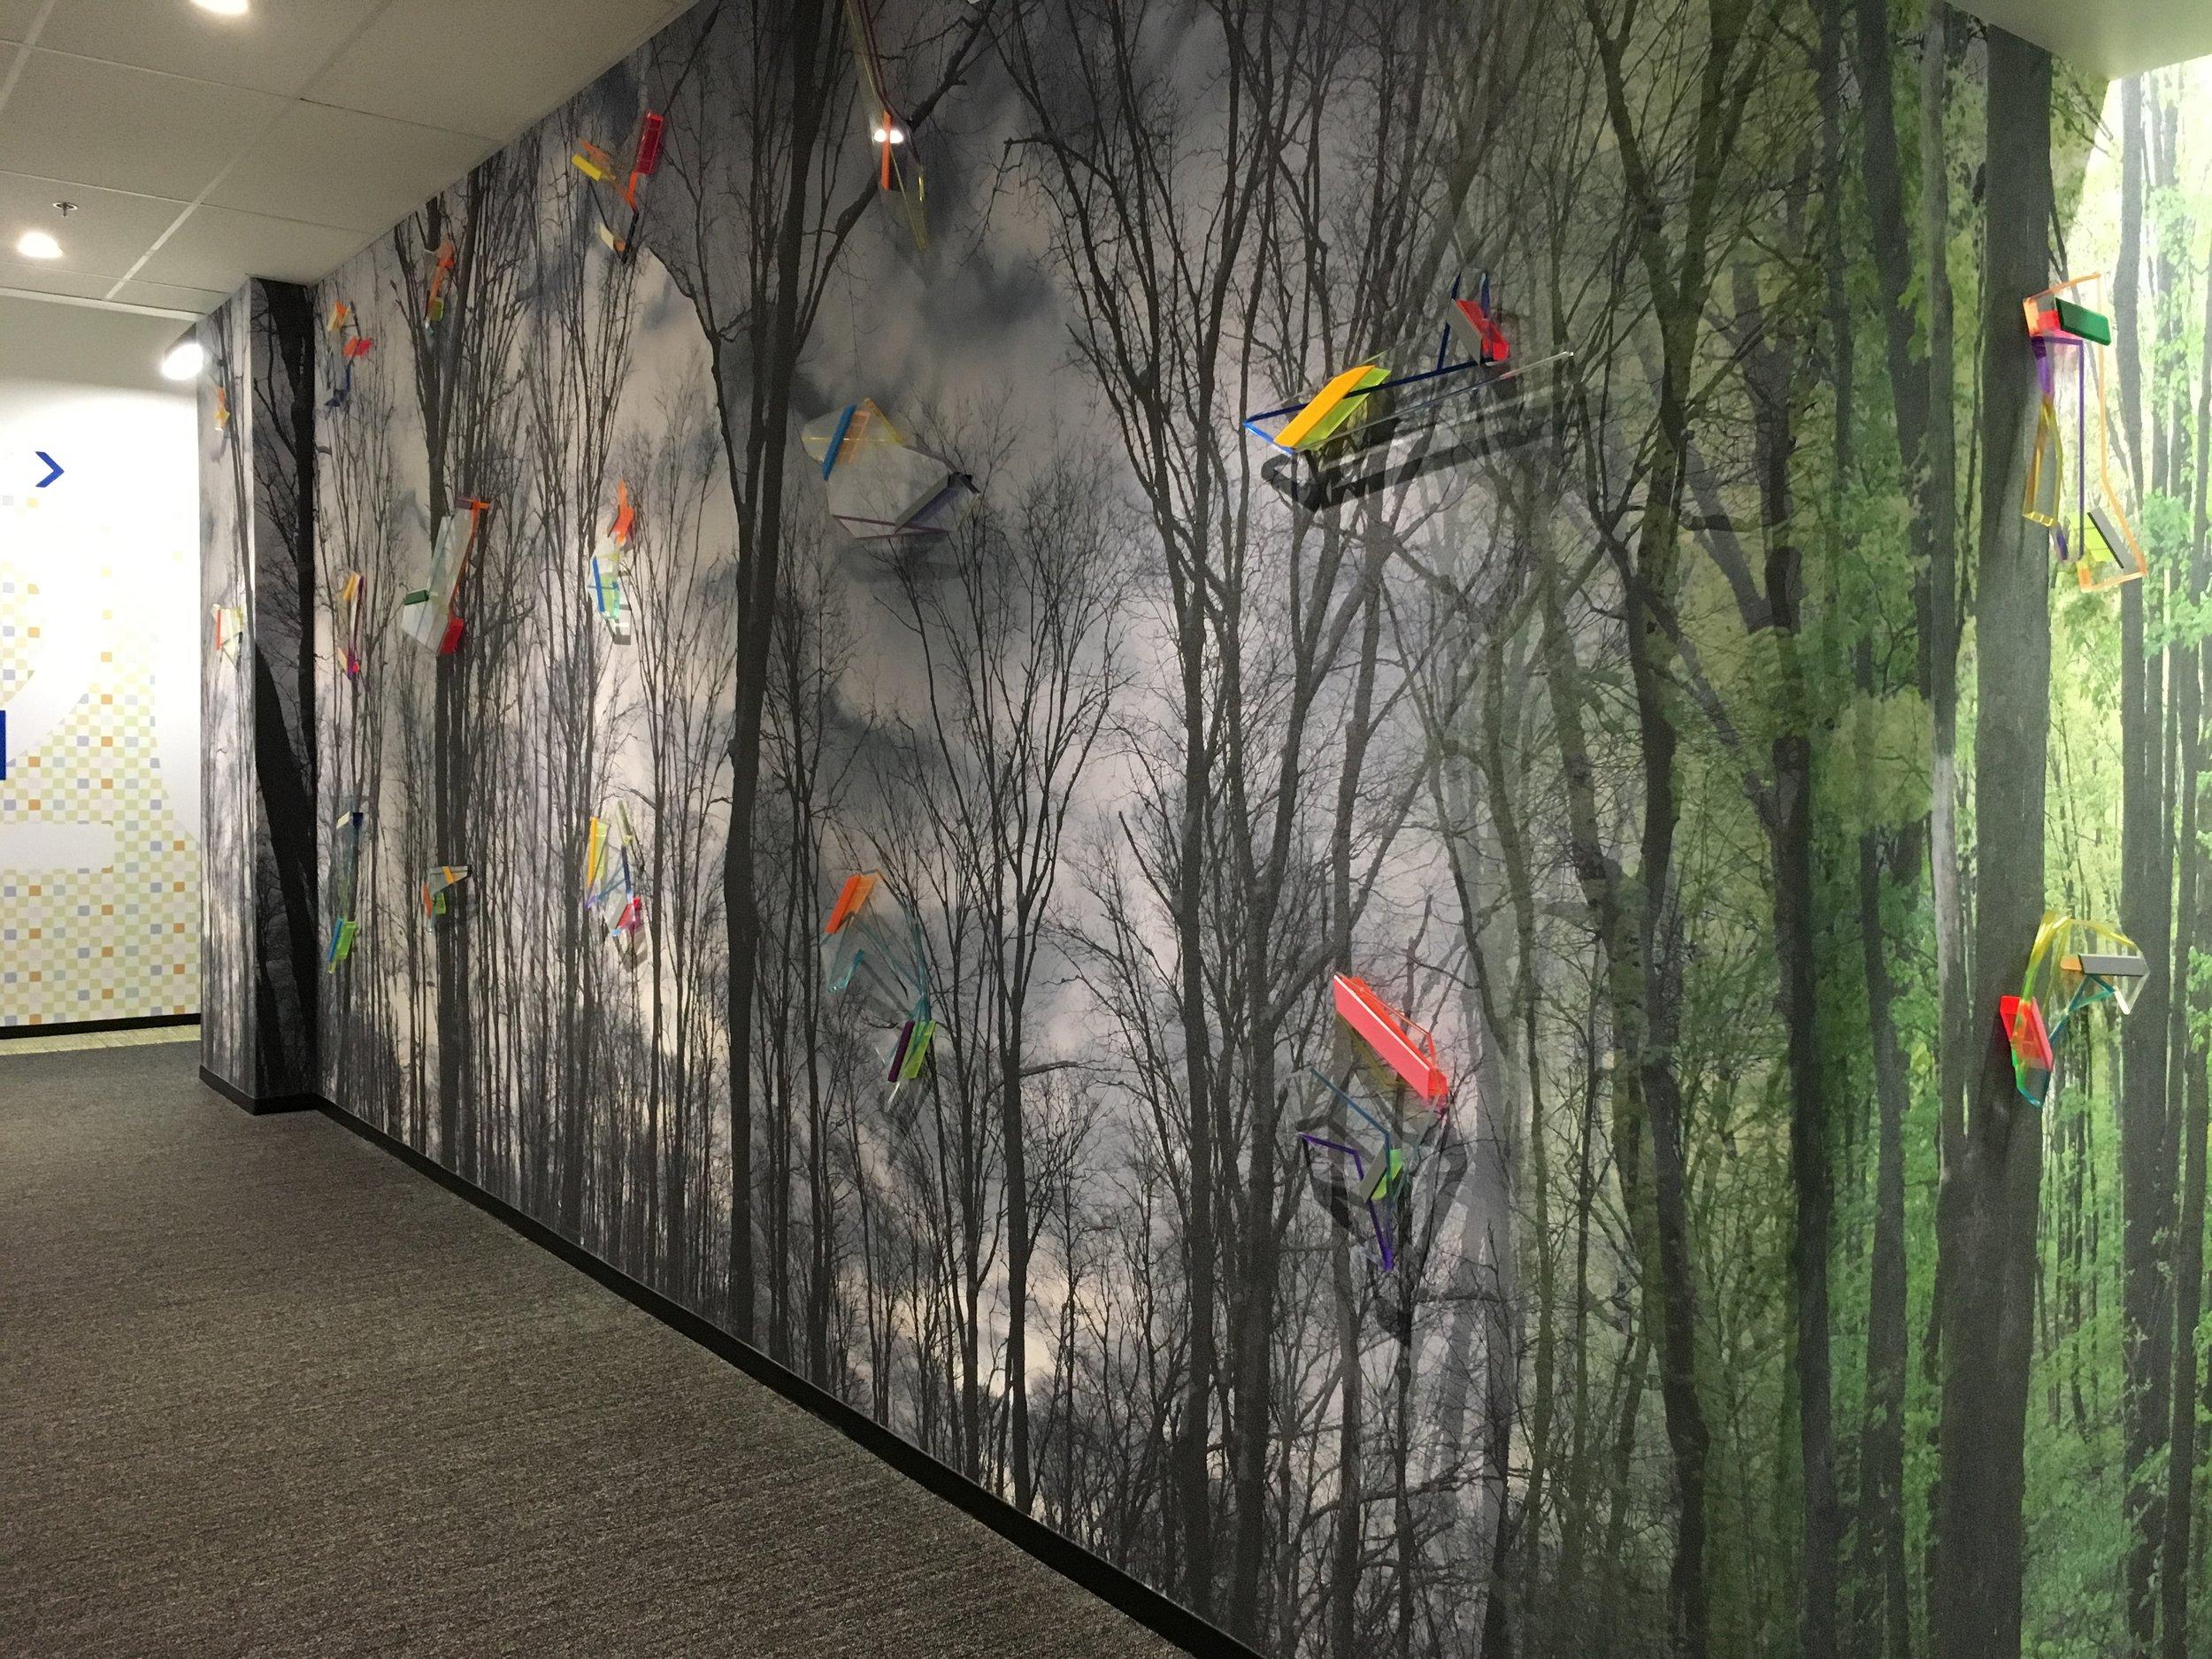 100 artworks, various sizes